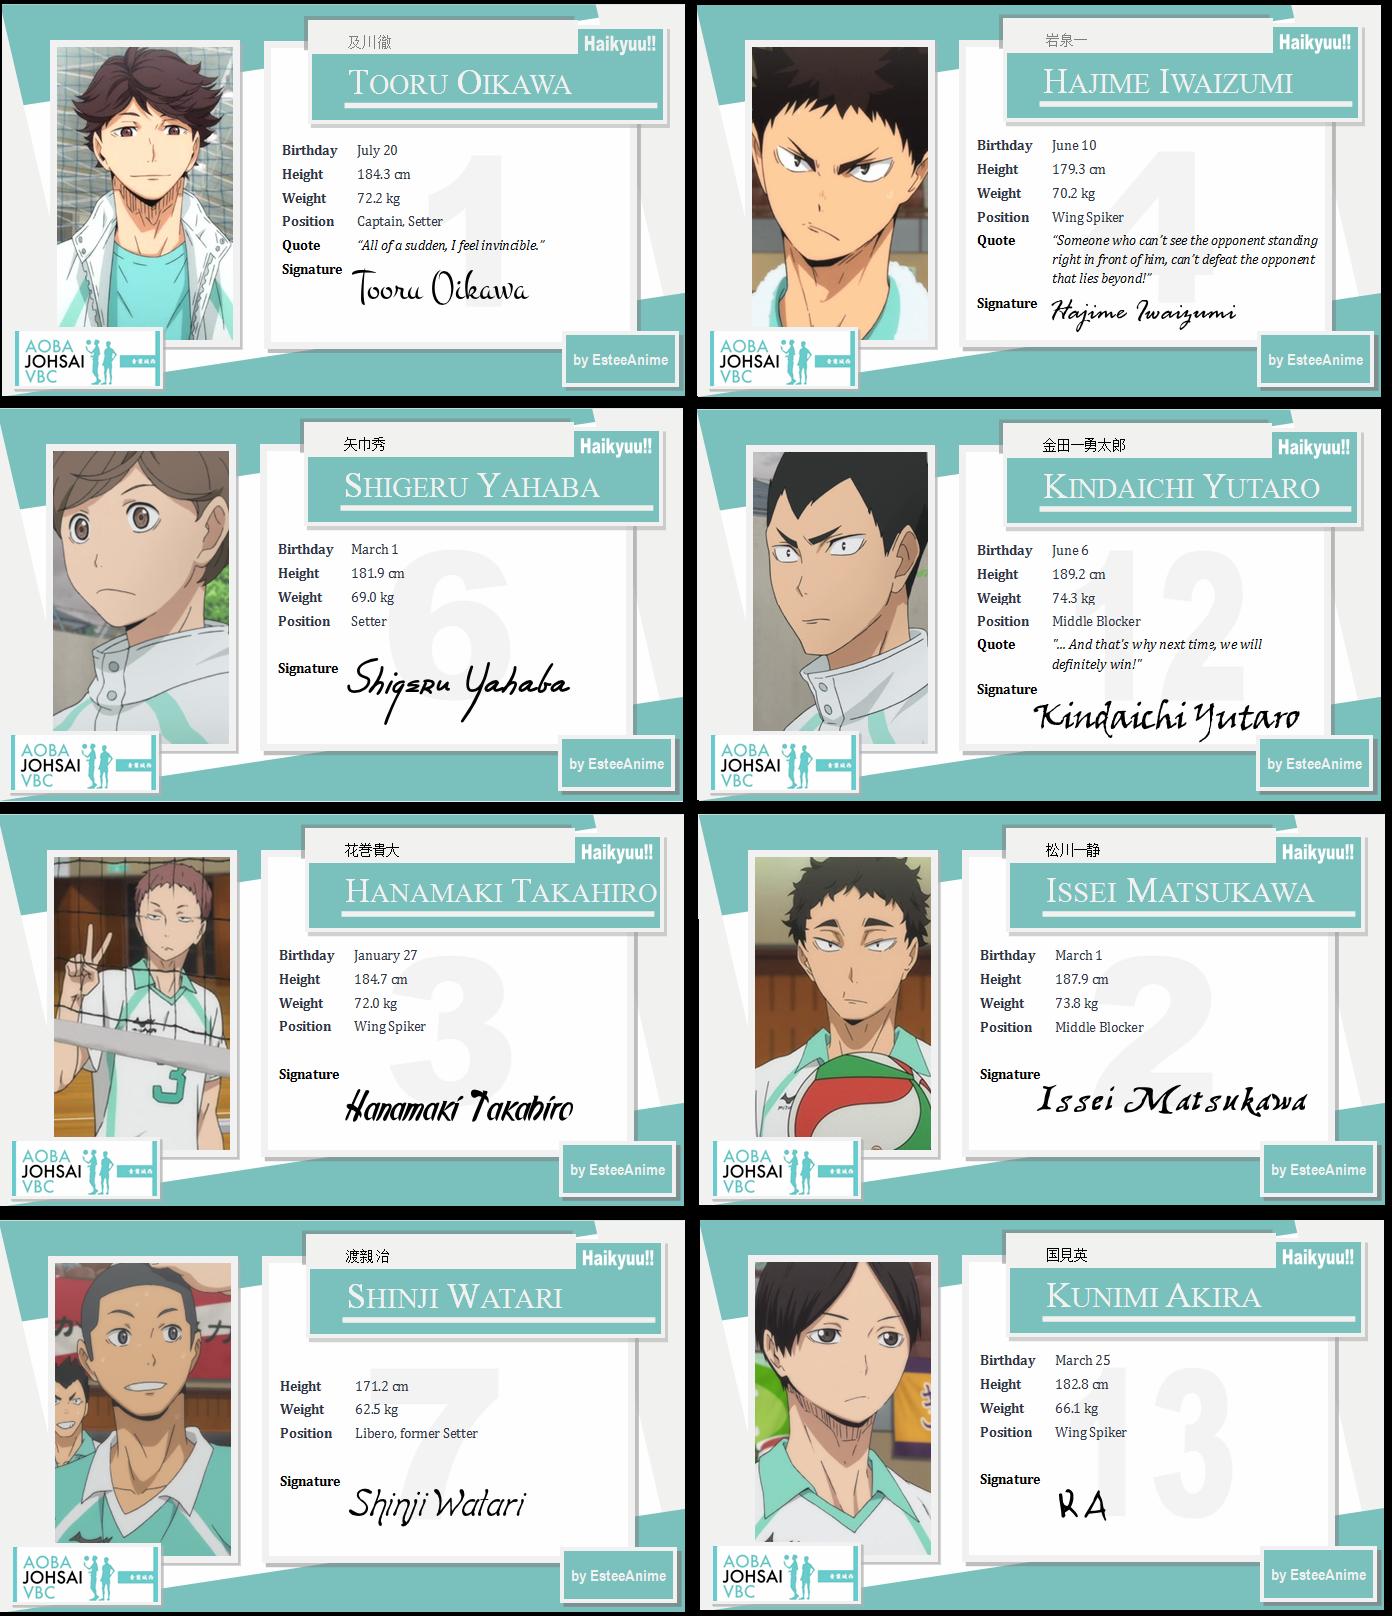 Haikyuu!! Character Cards - Aoba Josai by EsteeSo on DeviantArt